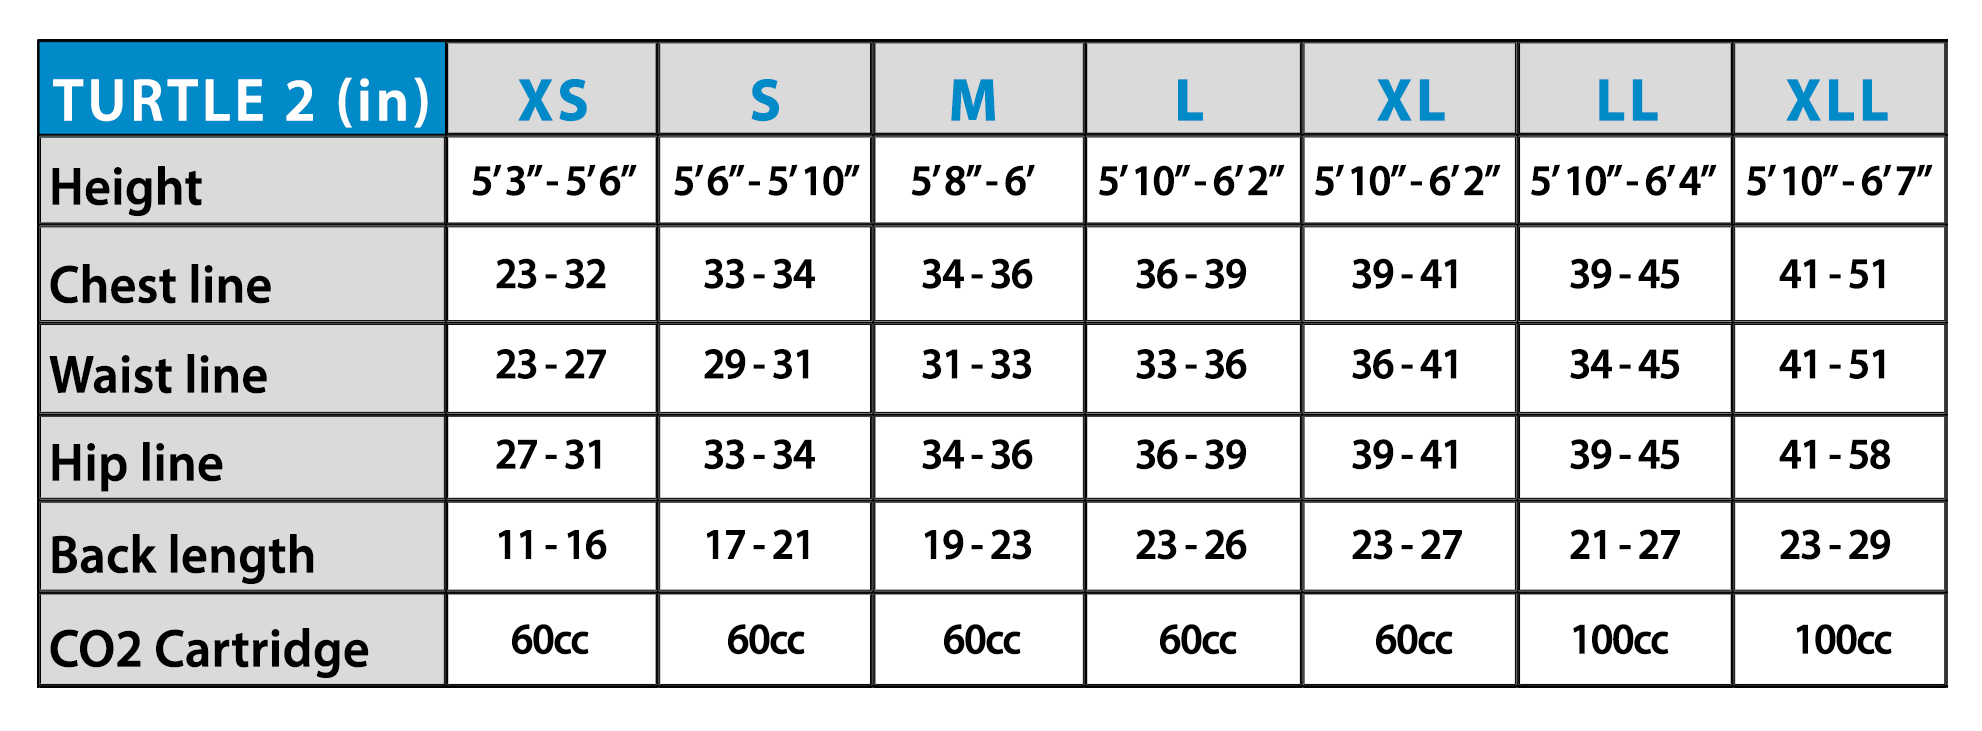 helite-sizing-chart-turtle-2.jpg